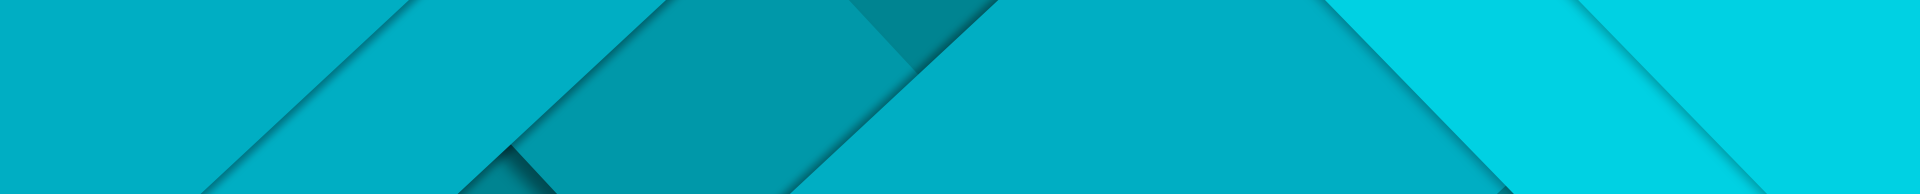 Banner-Material-design-v1